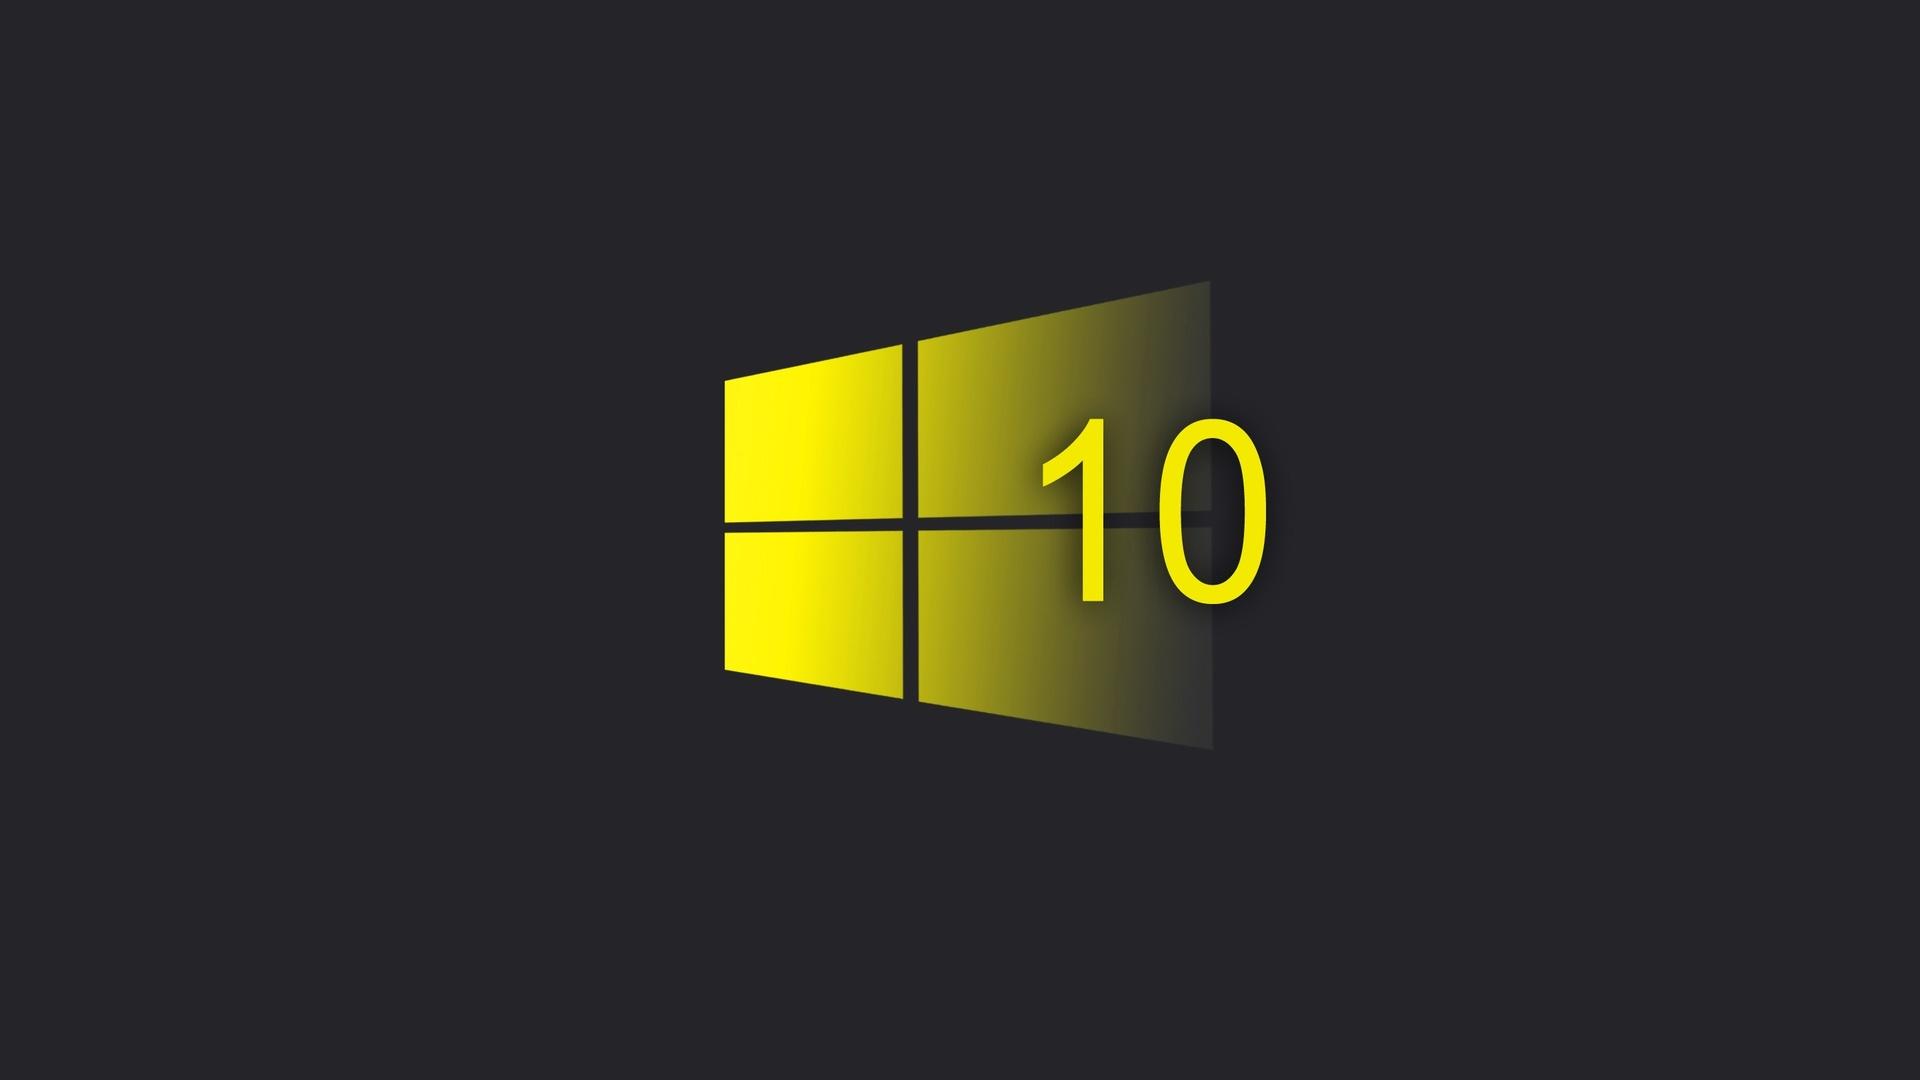 windows 10, yellow, logo, minimalism